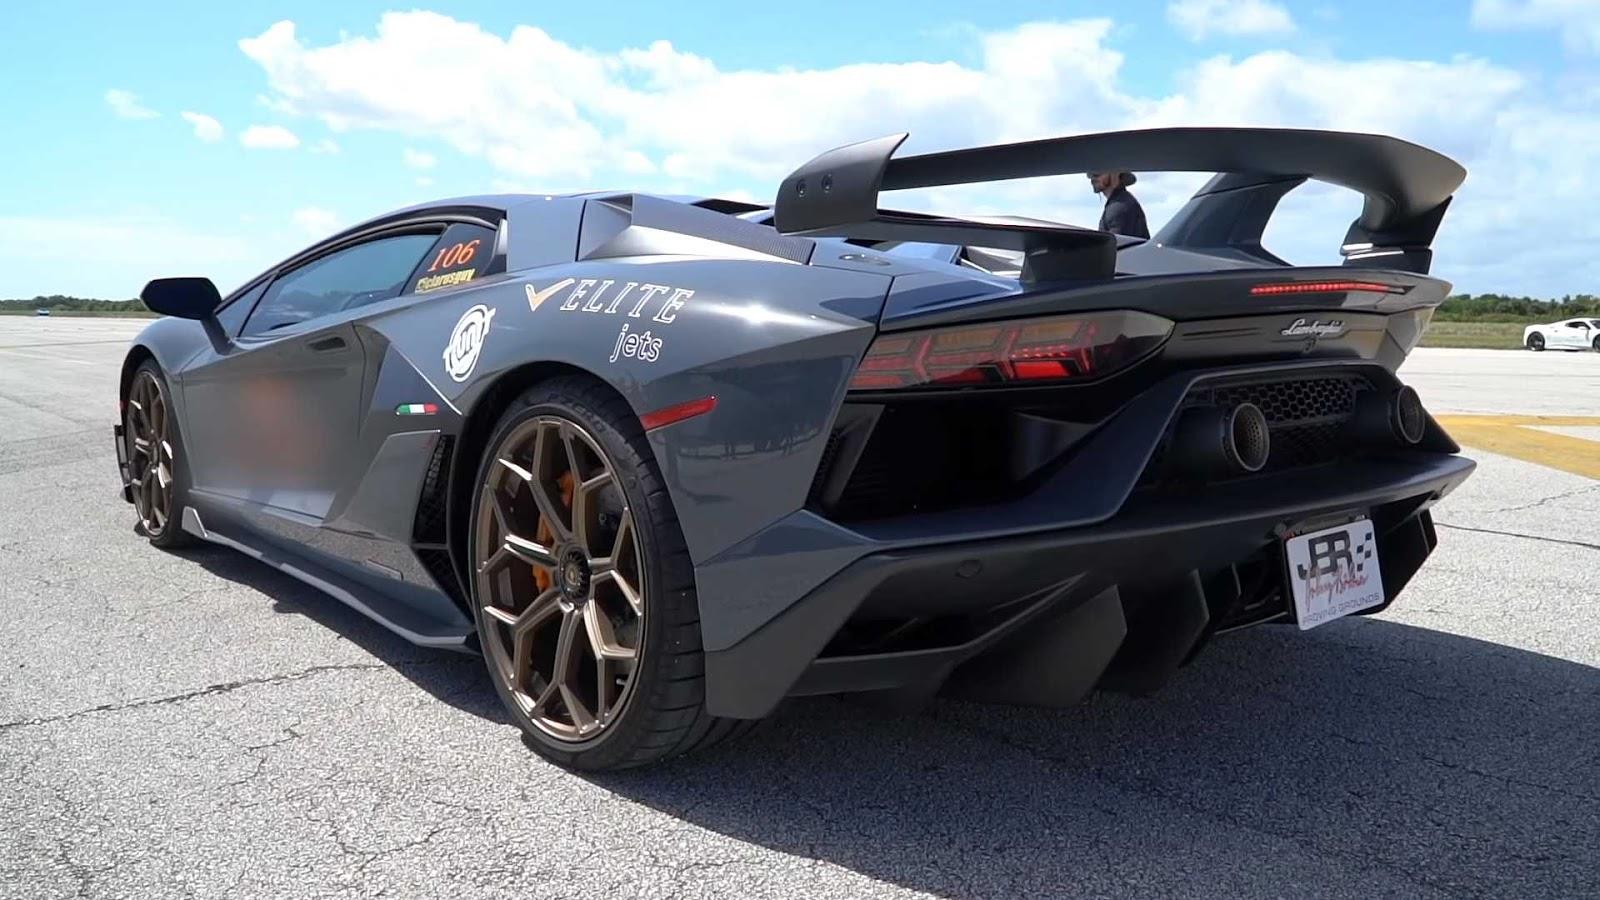 lamborghini aventador svj top speed Άκου μια Aventador SJV να ουρλιάζει ως τα 340 χαω Lamborghini, Lamborghini Aventador, topspeed, video, videos, βίντεο